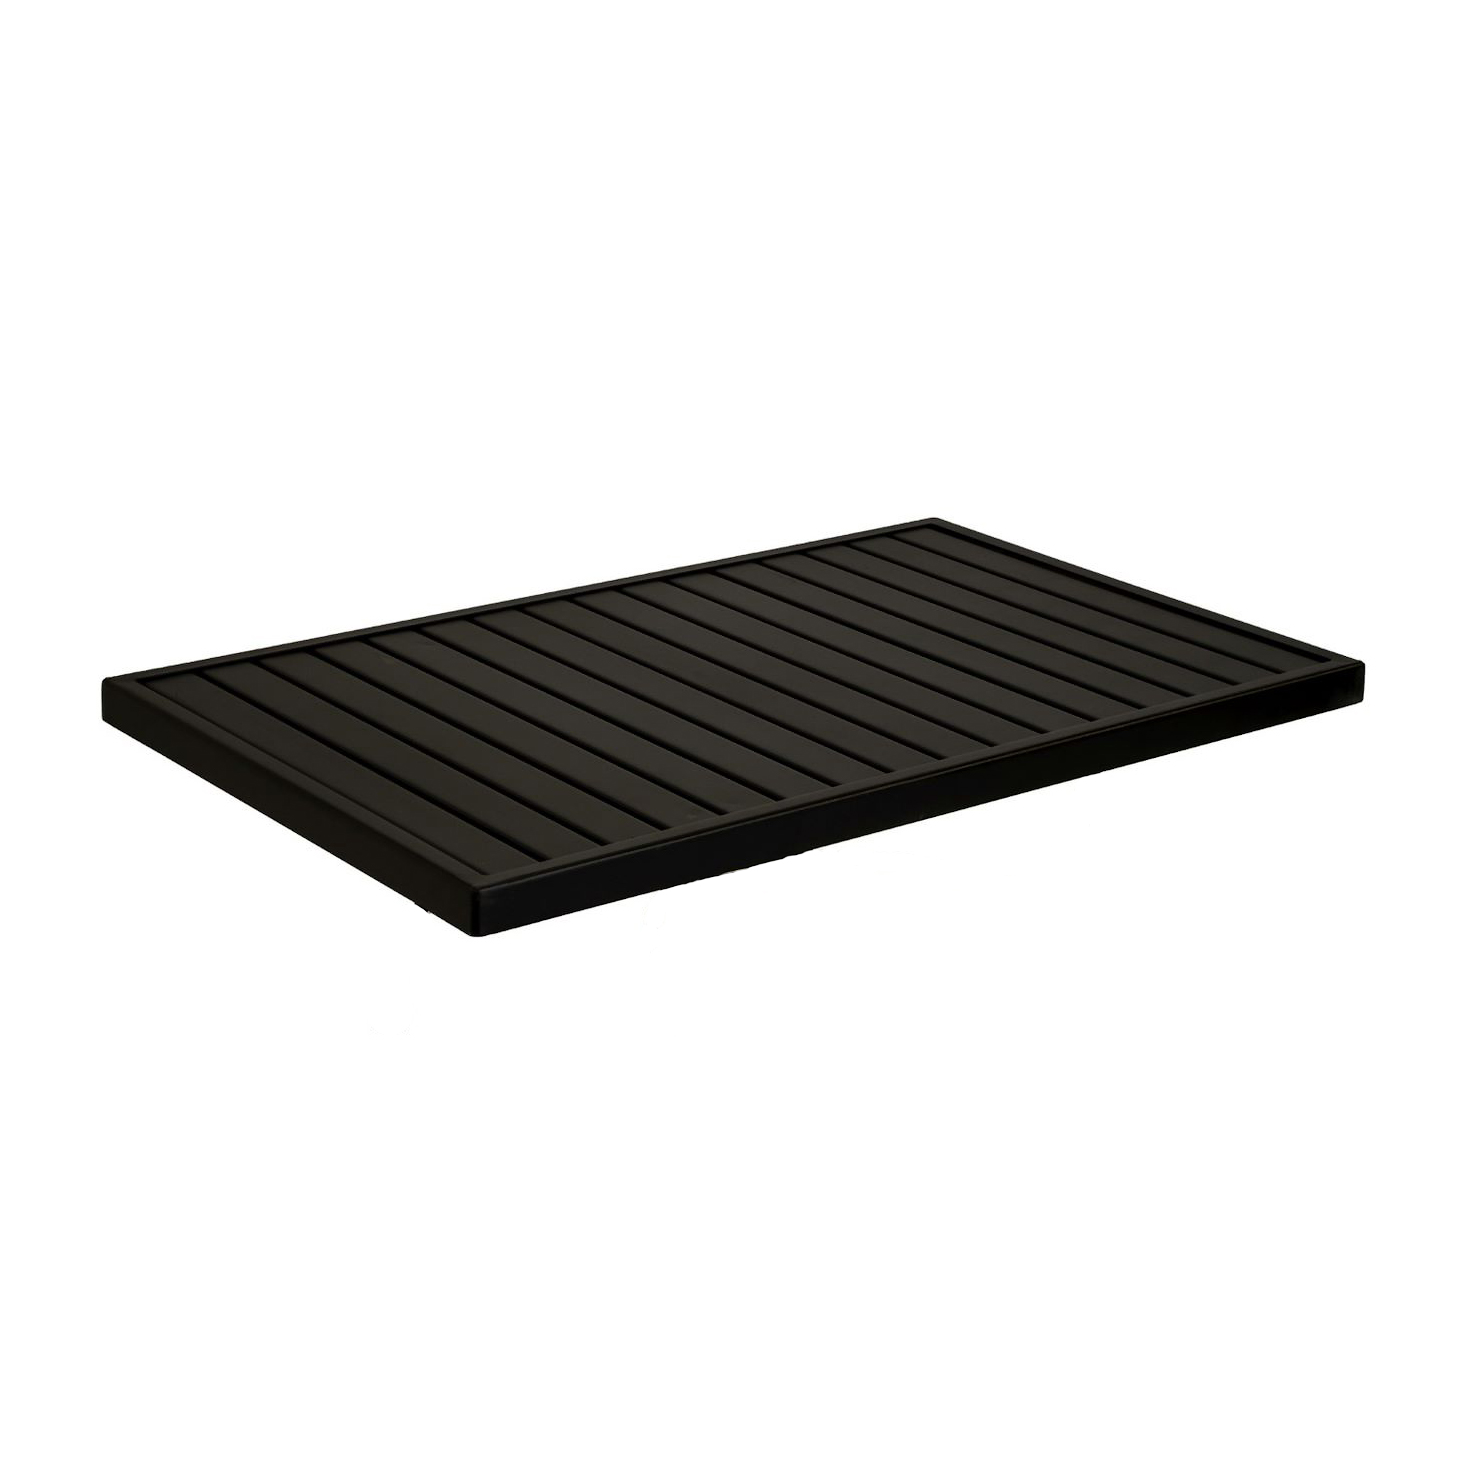 Meadowcraft 30 Inch x 48 Inch Rectangular Patio Table Top + Coffee Table Base | eBay